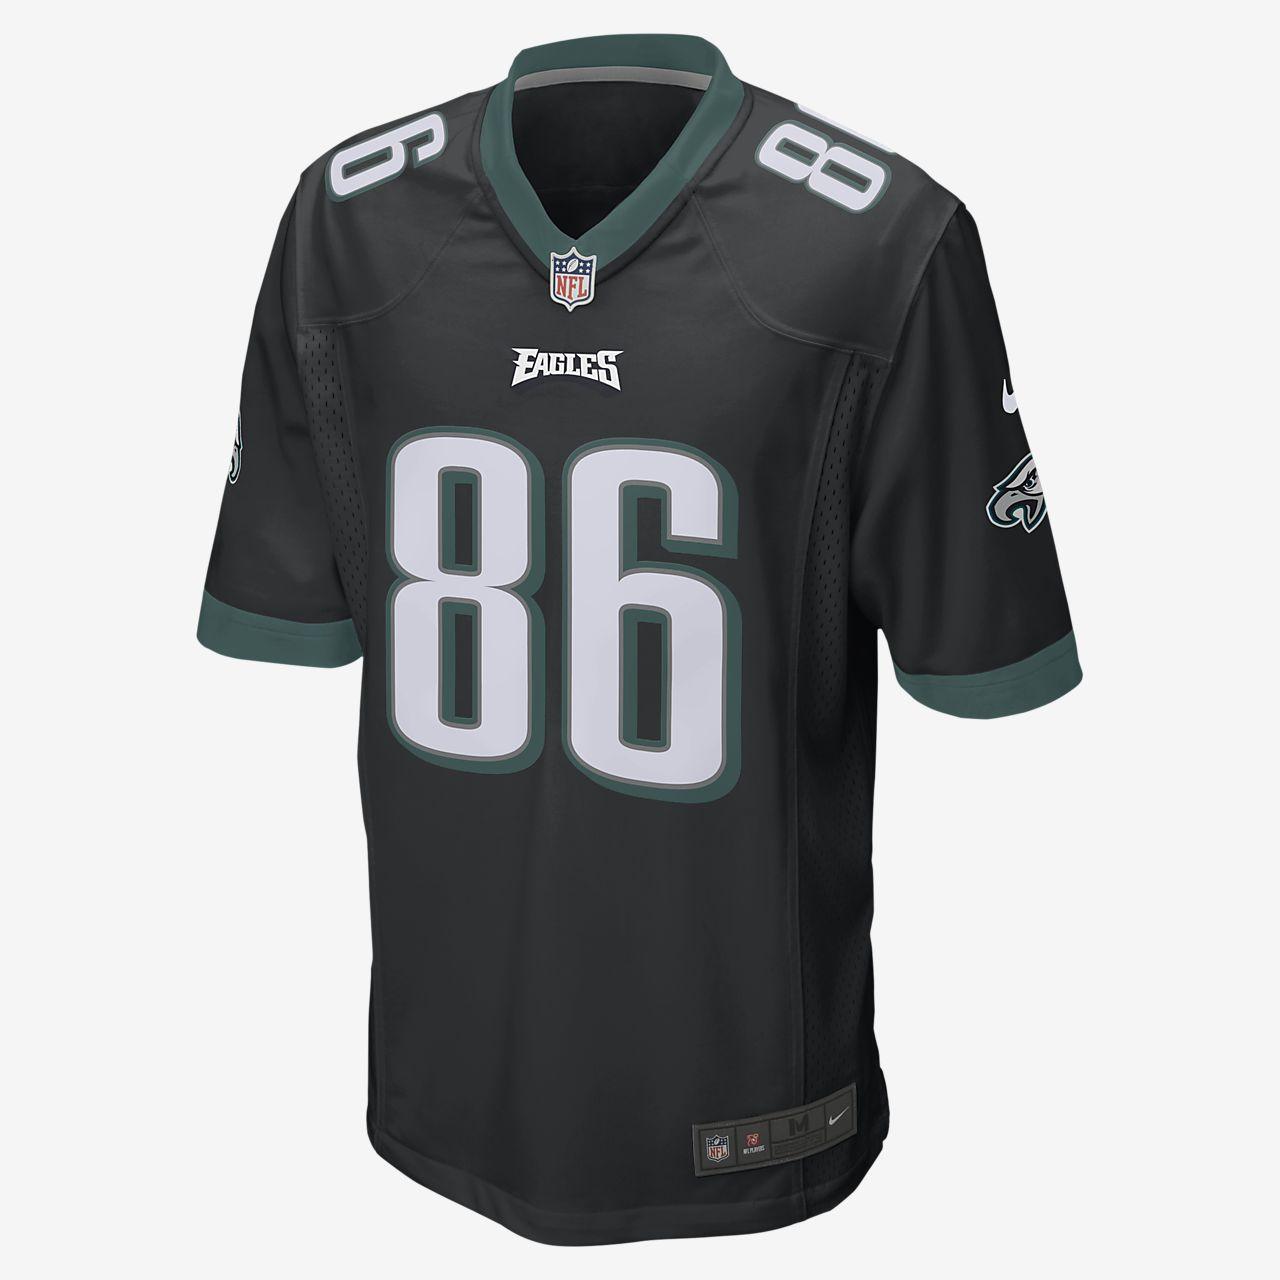 0118a74ea NFL Philadelphia Eagles Game (Zach Ertz) Men s Football Jersey. Nike.com